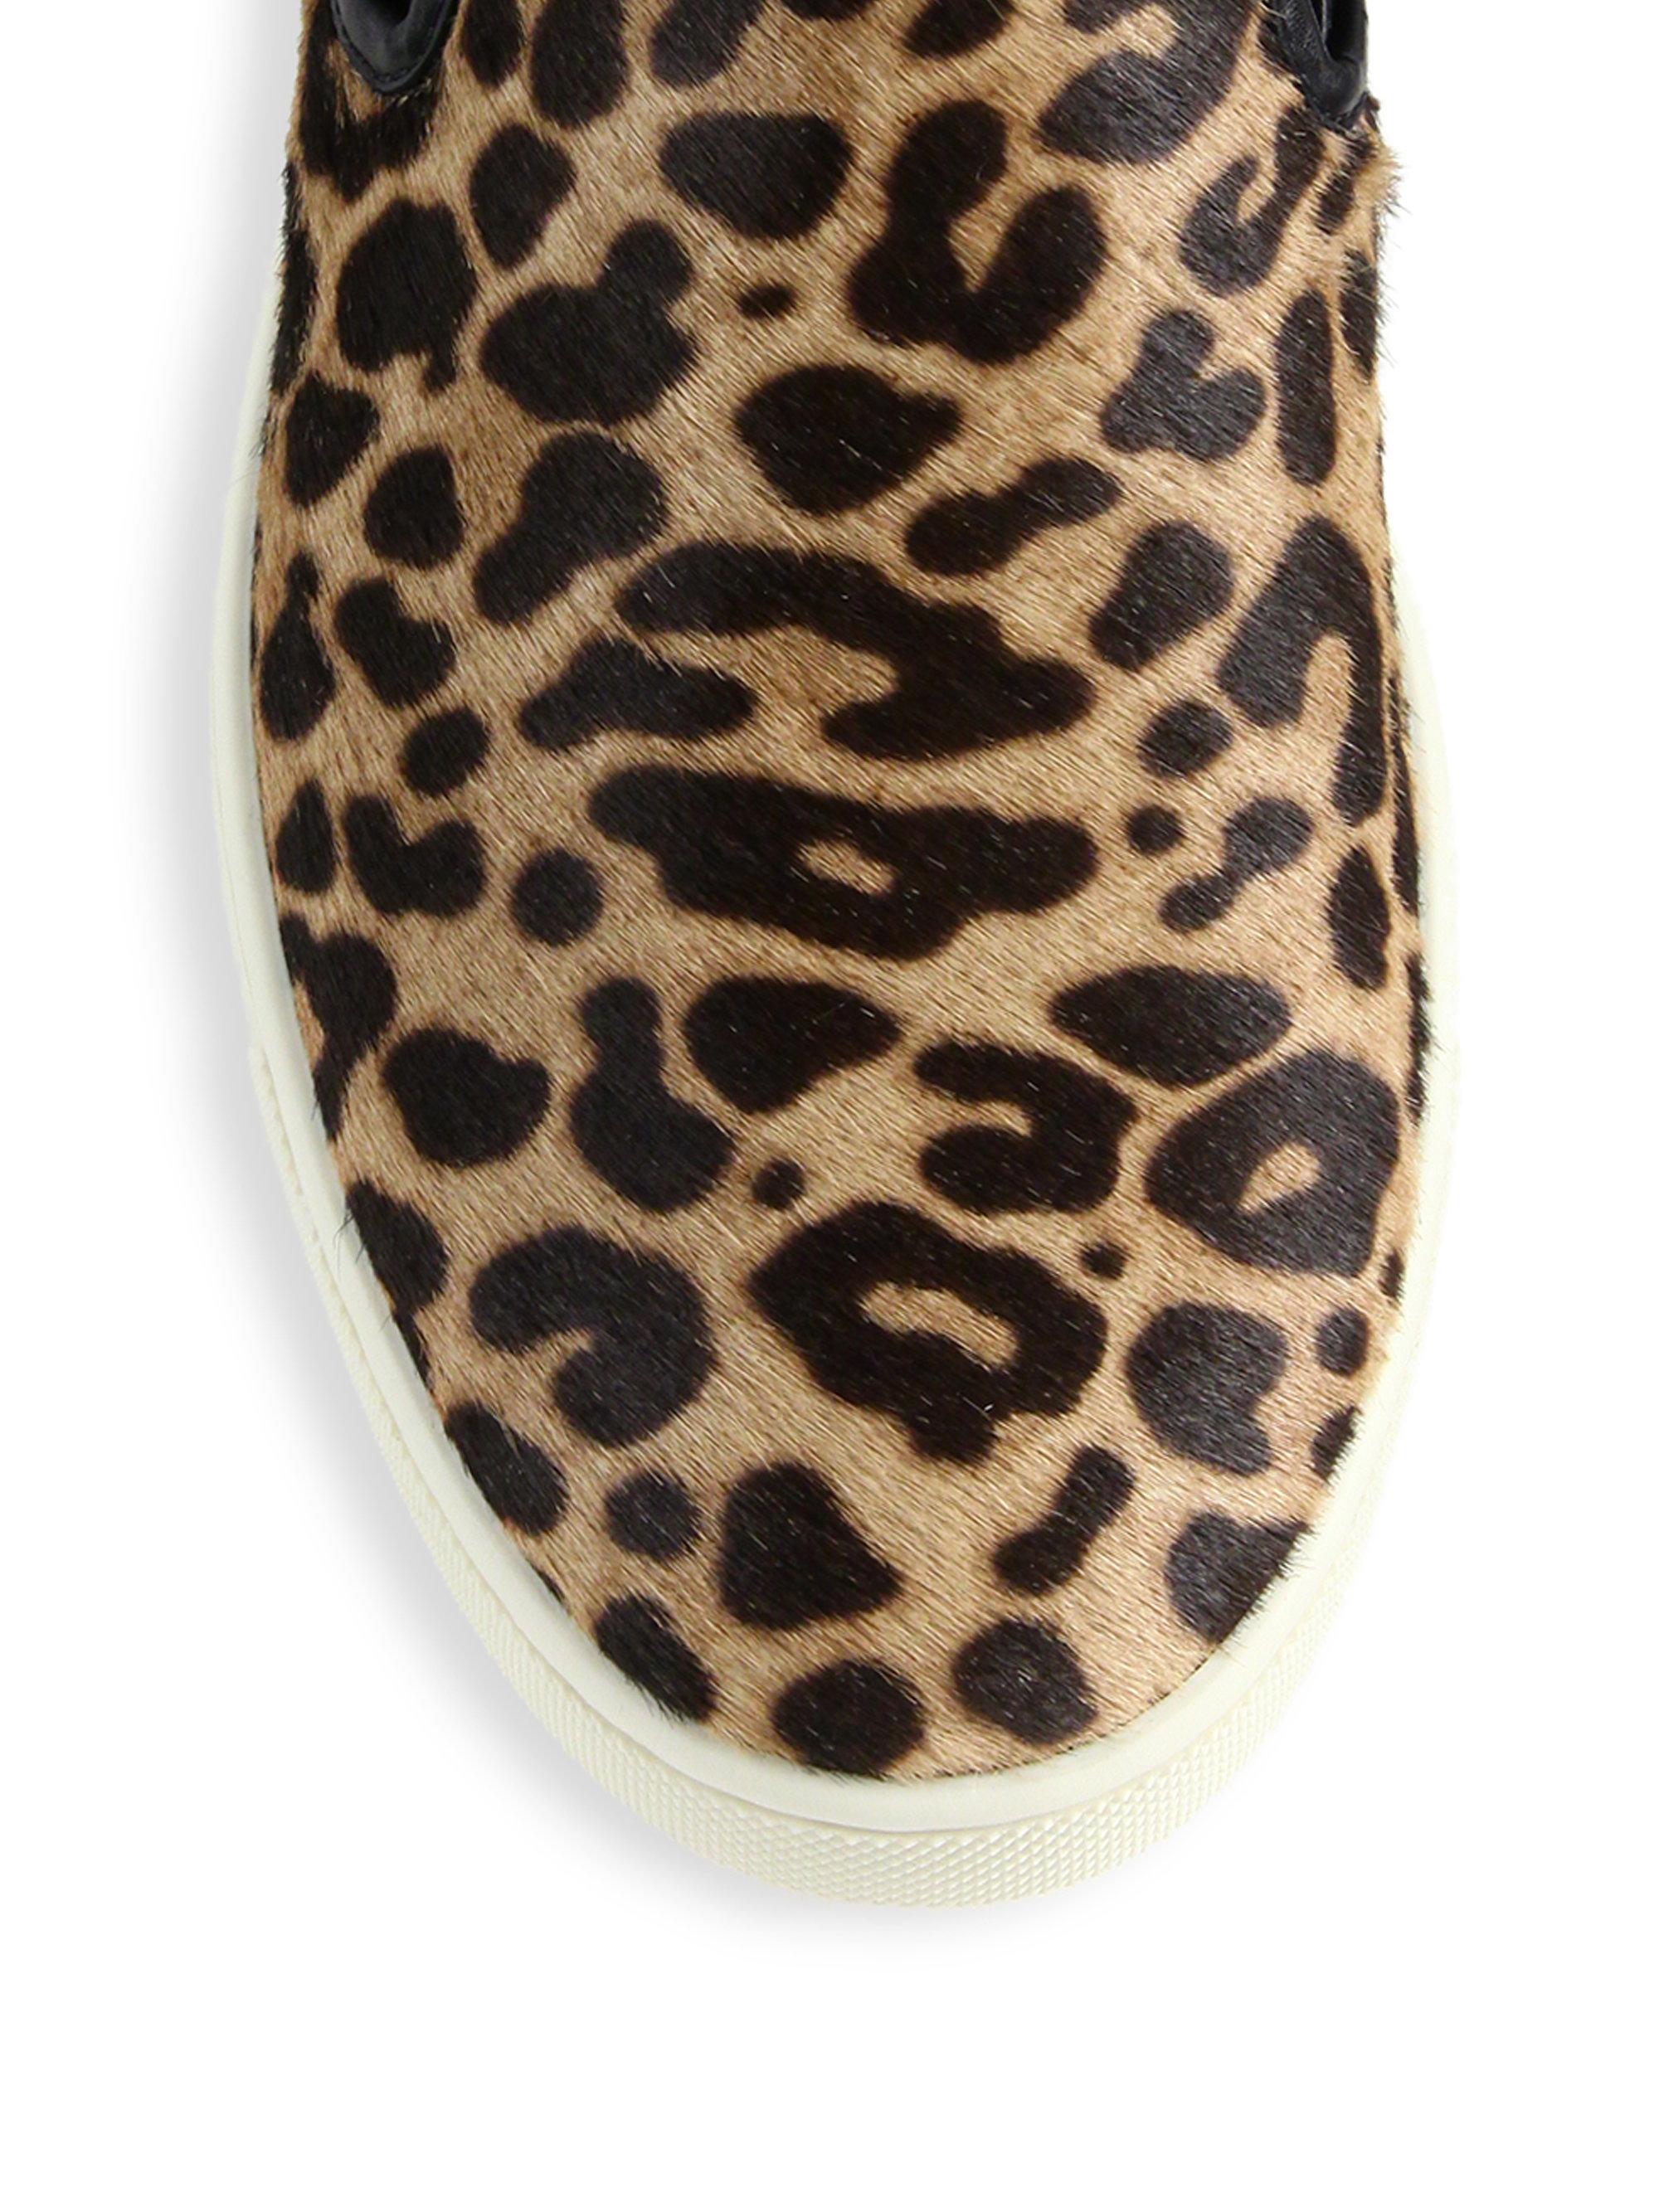 30940a932849 Christian Louboutin Master Key Leopard-print Calf Hair & Leather ...